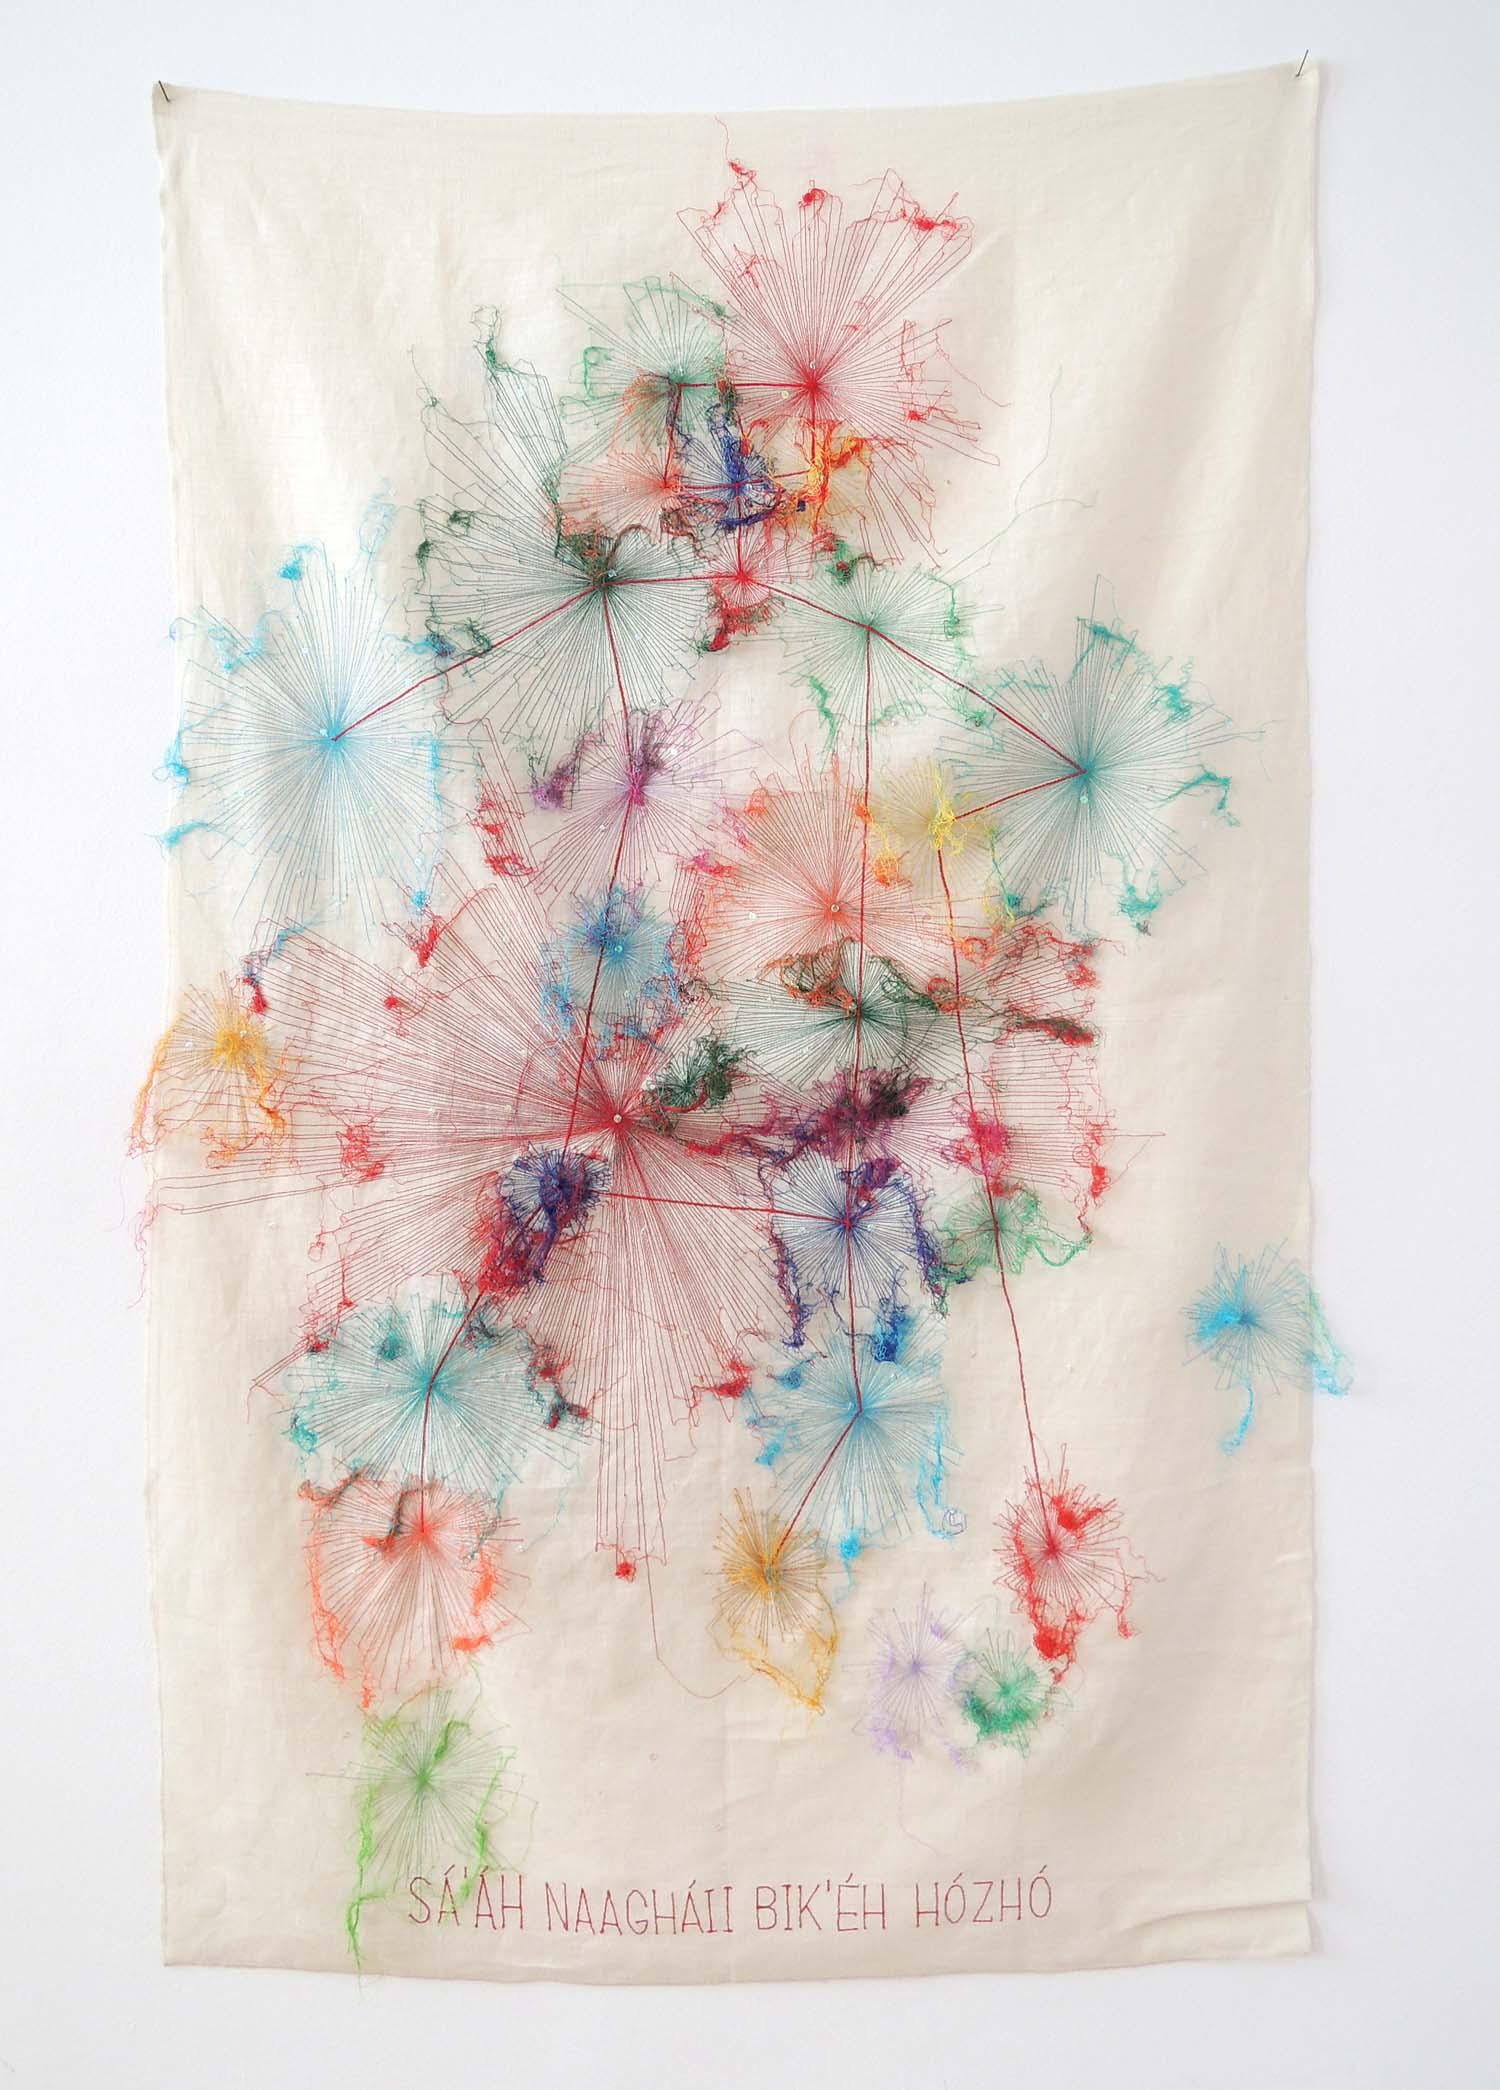 The Elder. 2014. Studio Guenzani, Milan. Ph: Barbara Asnaghi